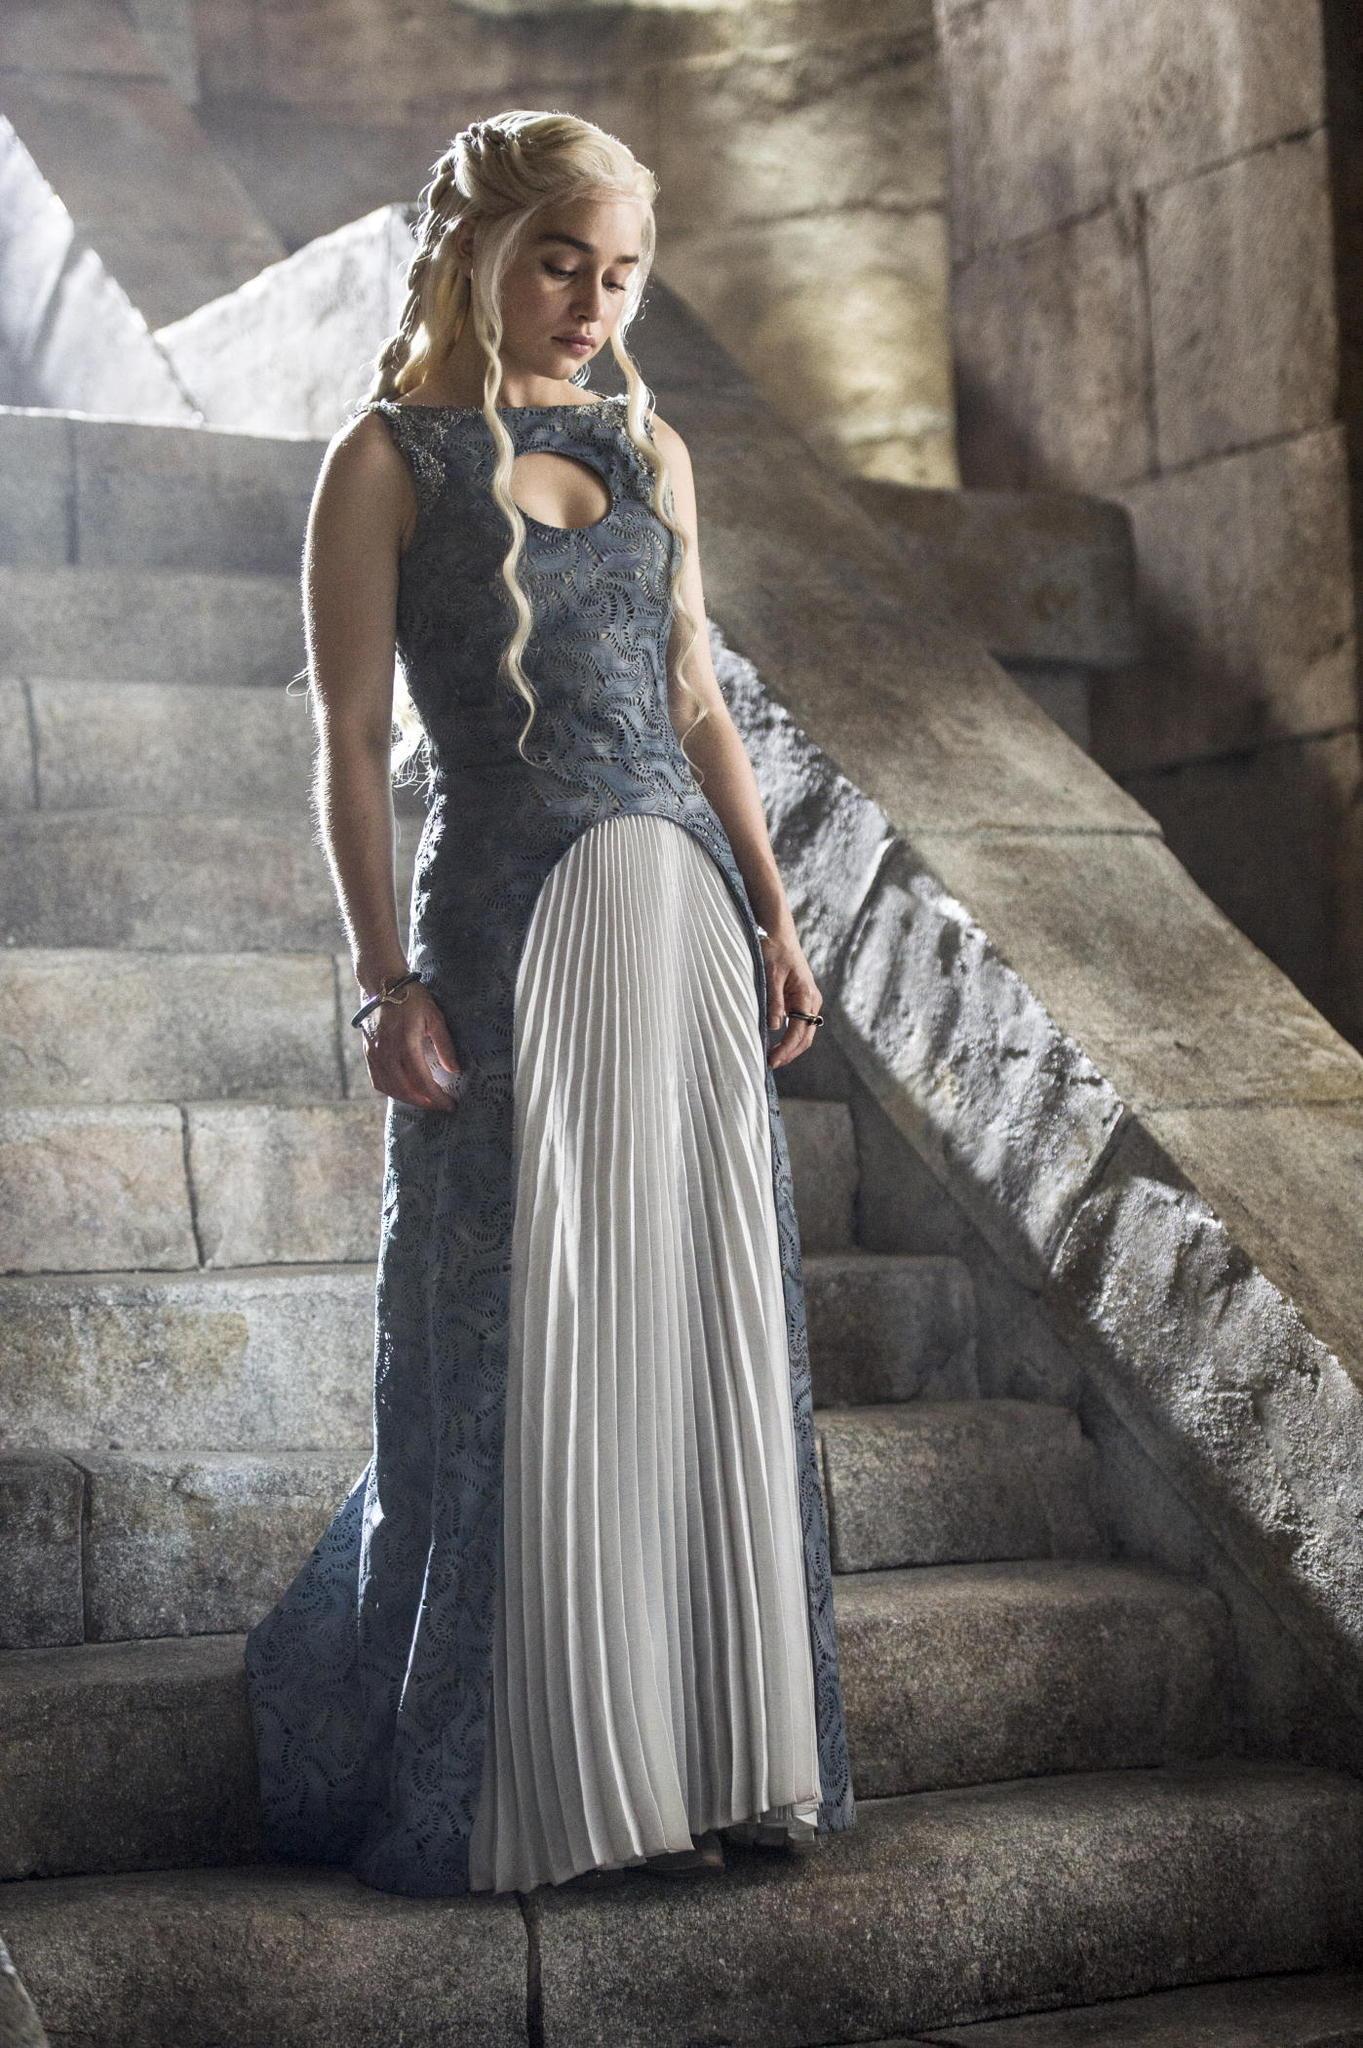 Gra o Tron S04E10 Daenerys